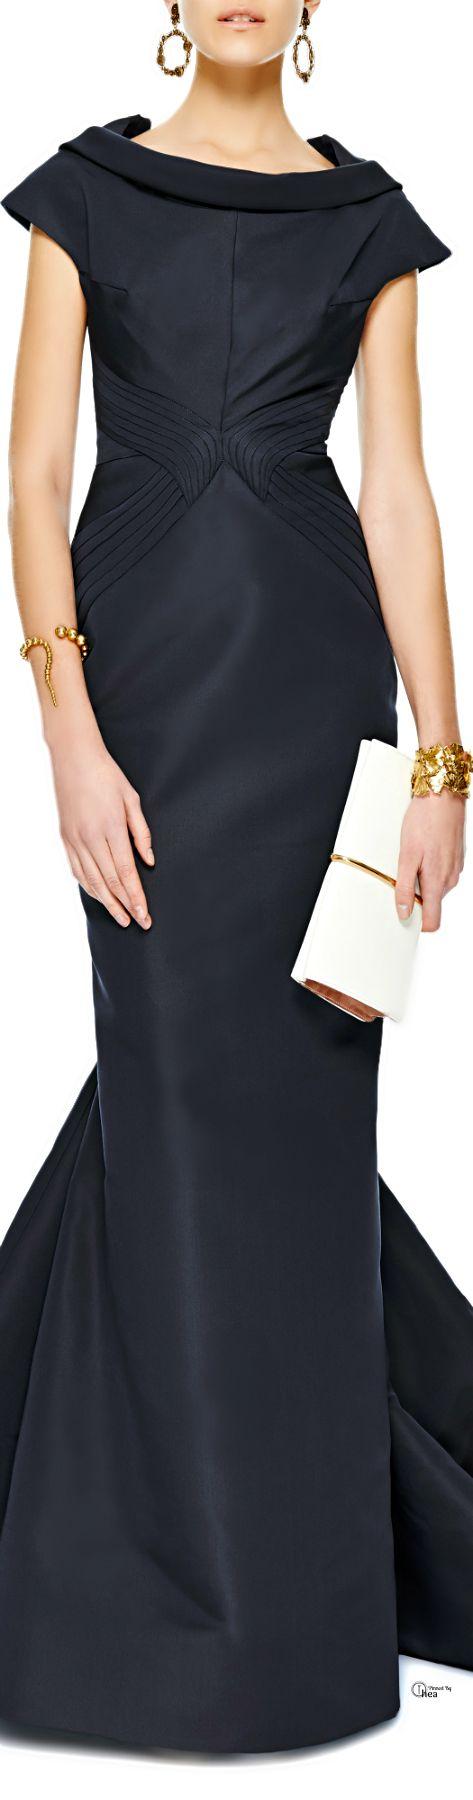 Zac Posen ● Silk-Faille Drape-Neck Gown. V